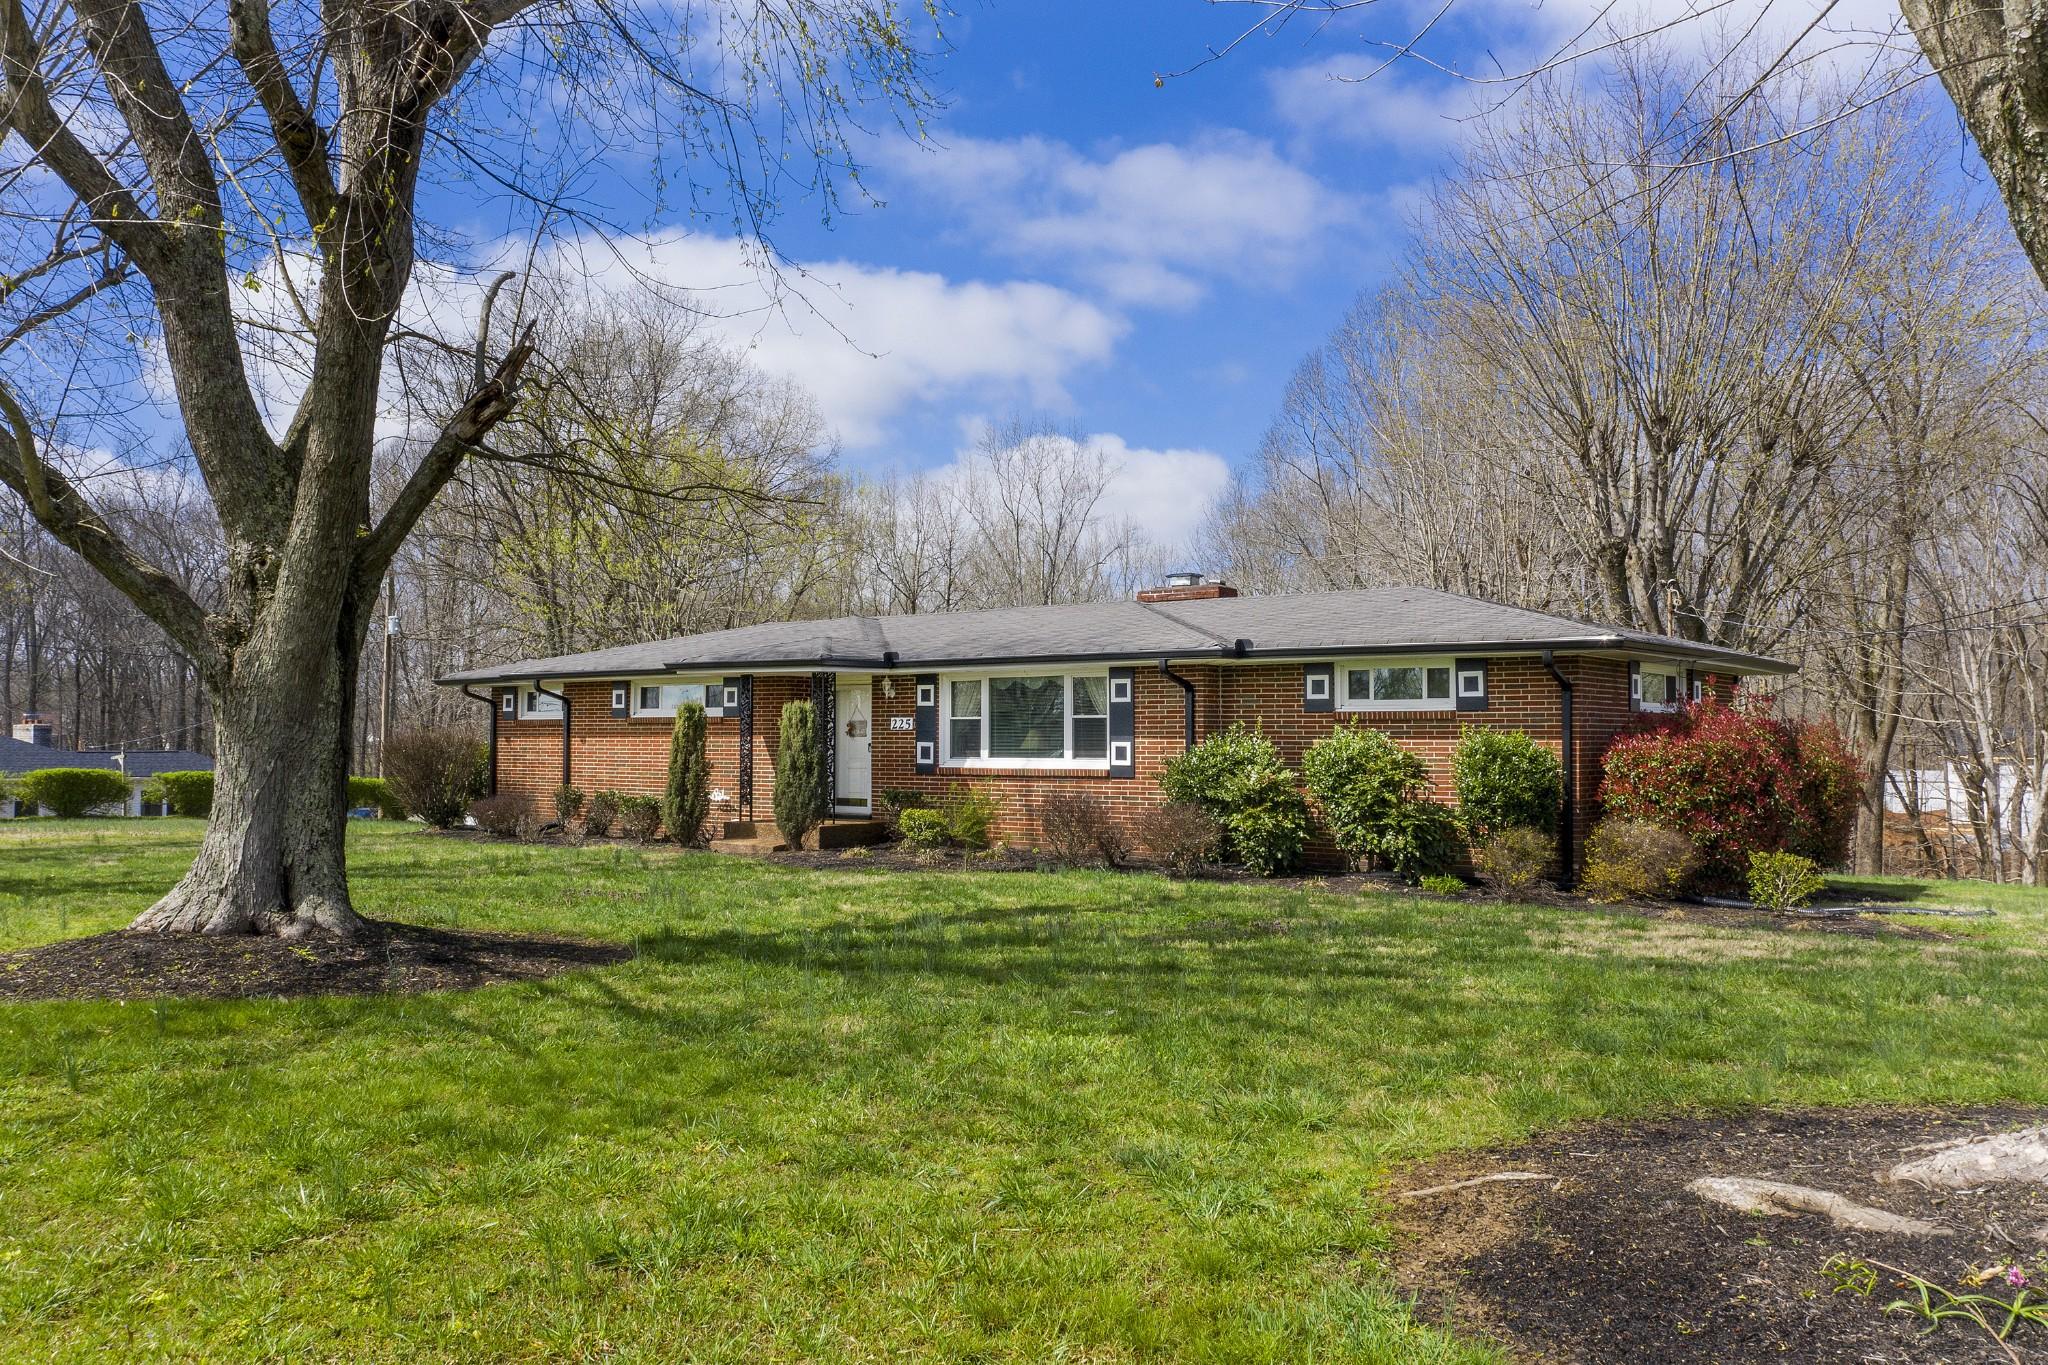 225 Ed Harris Rd, Ashland City, TN 37015 - Ashland City, TN real estate listing